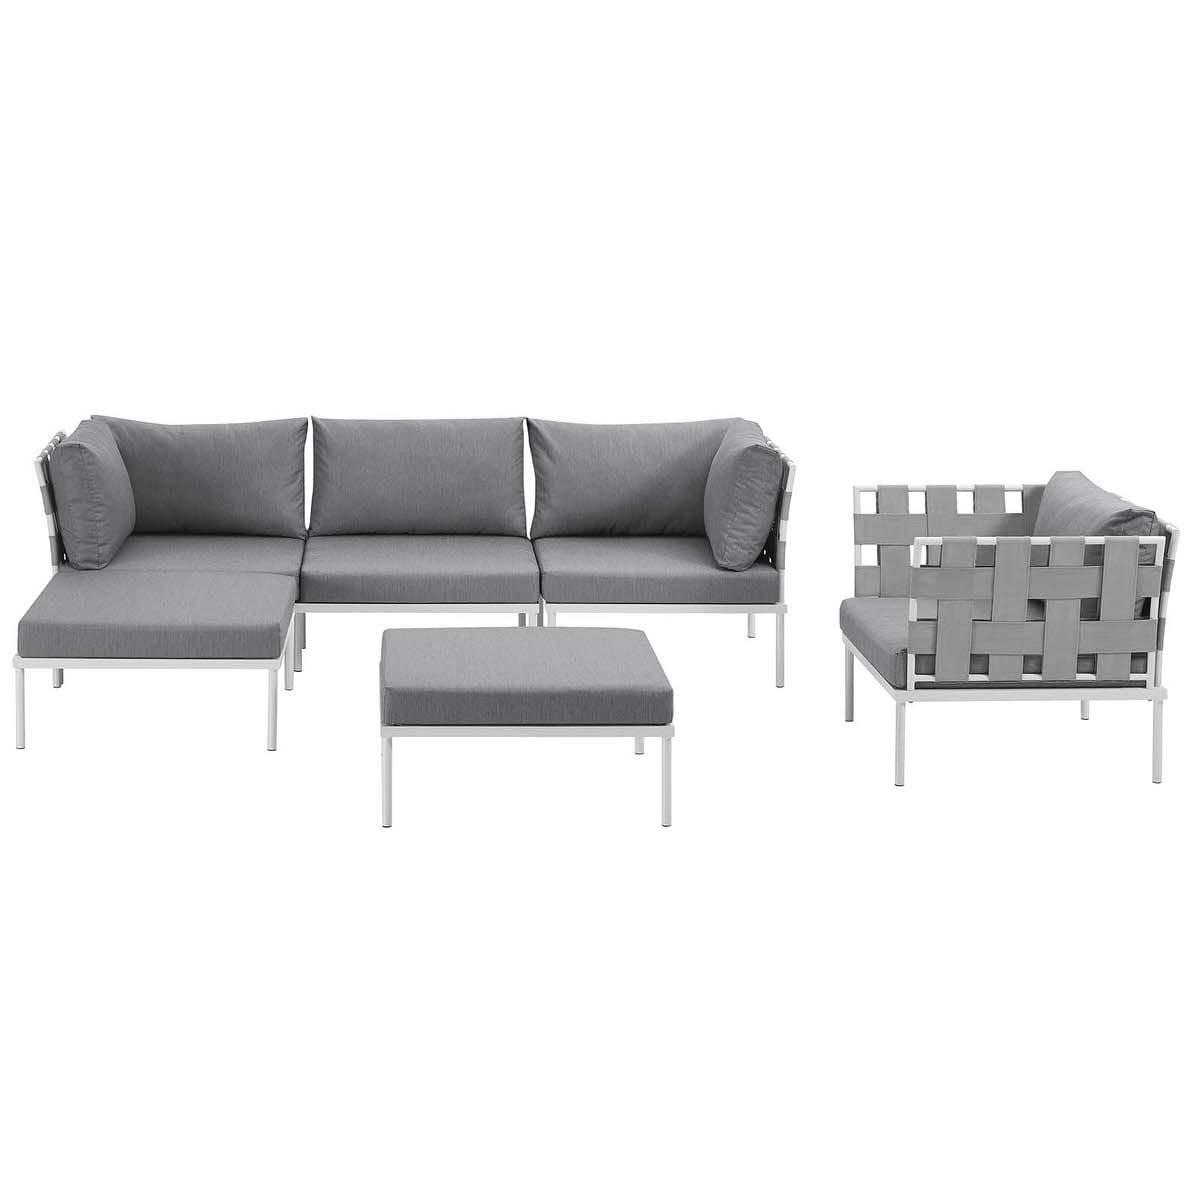 Harmony 6 Piece Outdoor Patio Aluminum Sectional Sofa Set White Gray ...